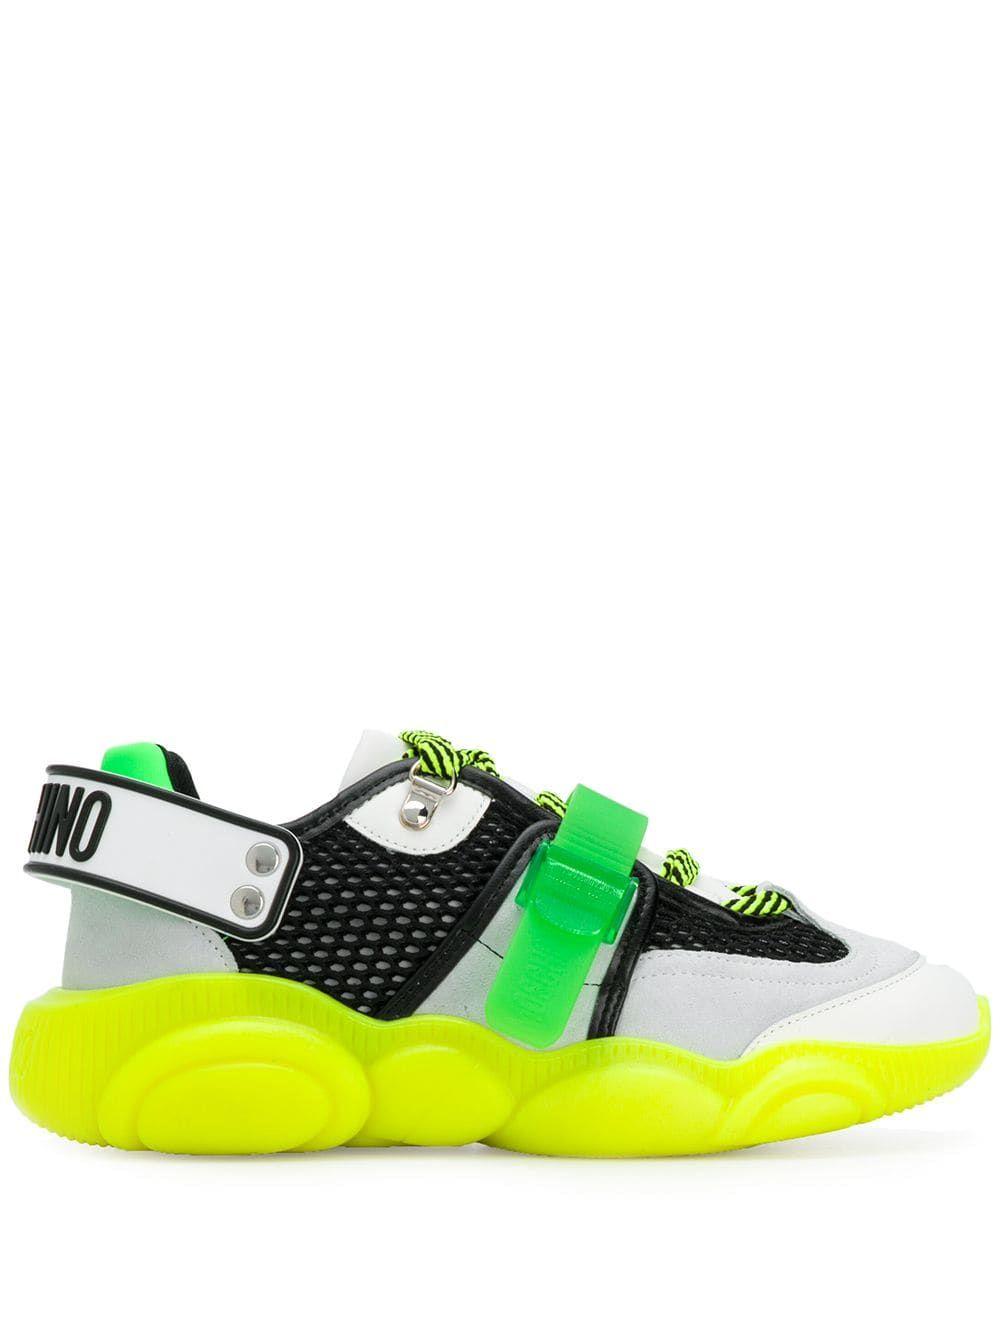 Moschino Teddy Sneakers - Farfetch